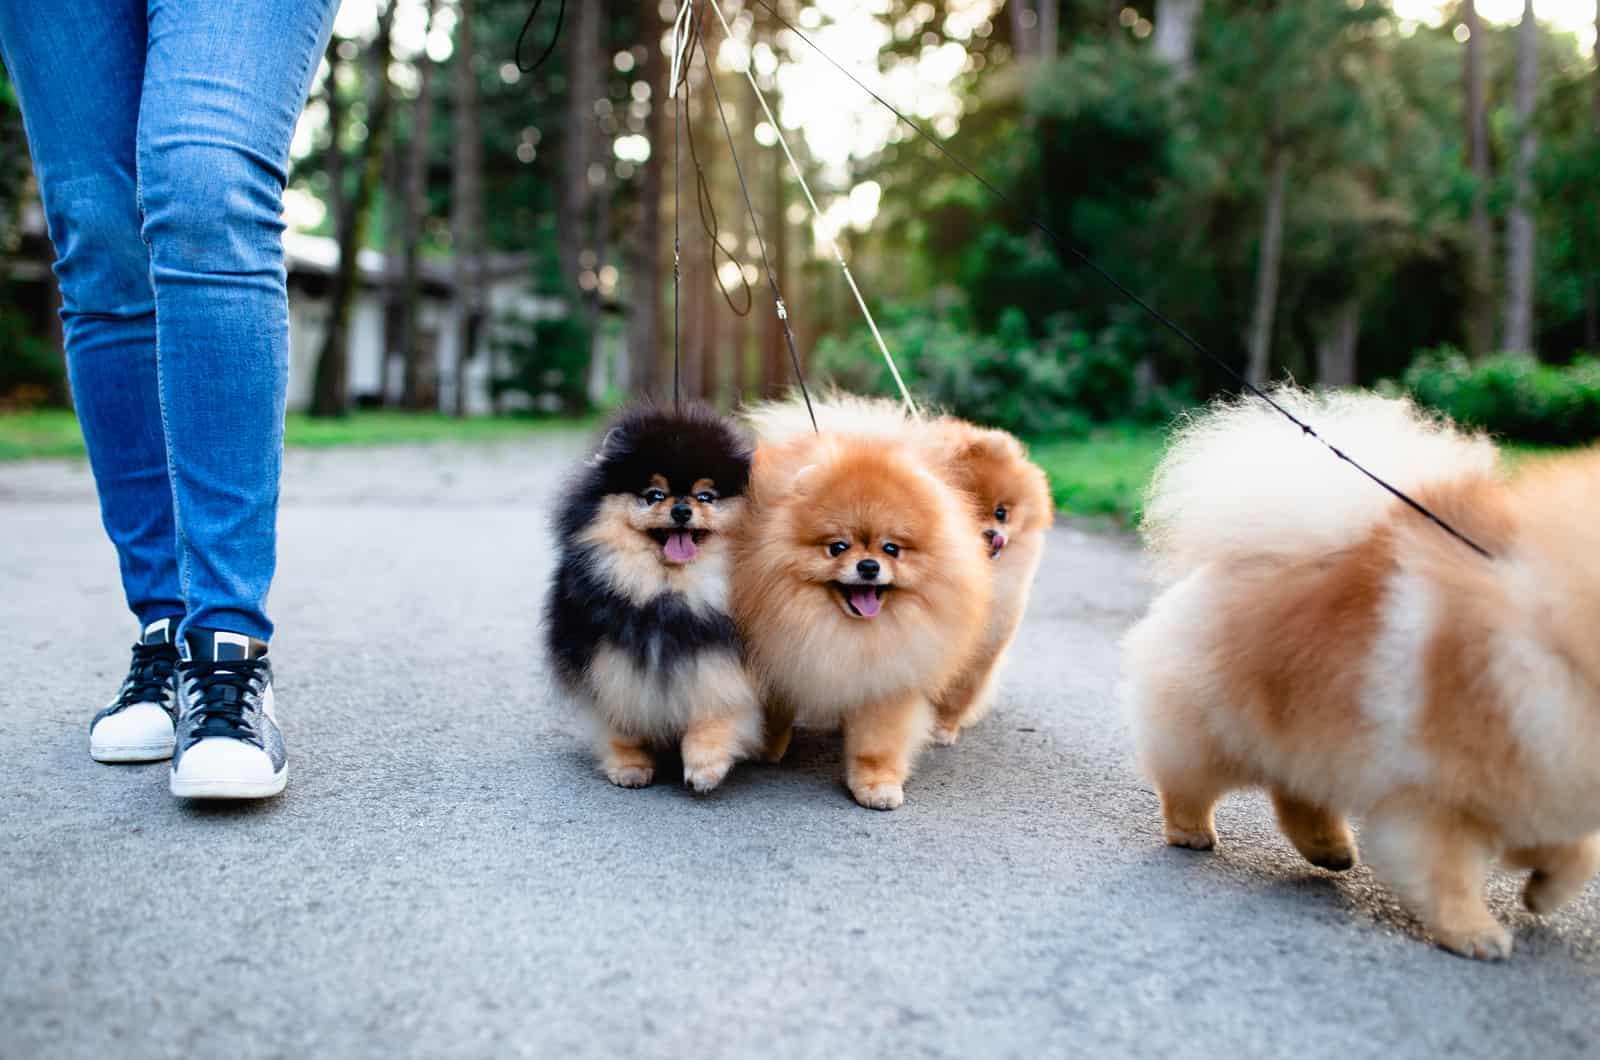 two pomeranians on a leash